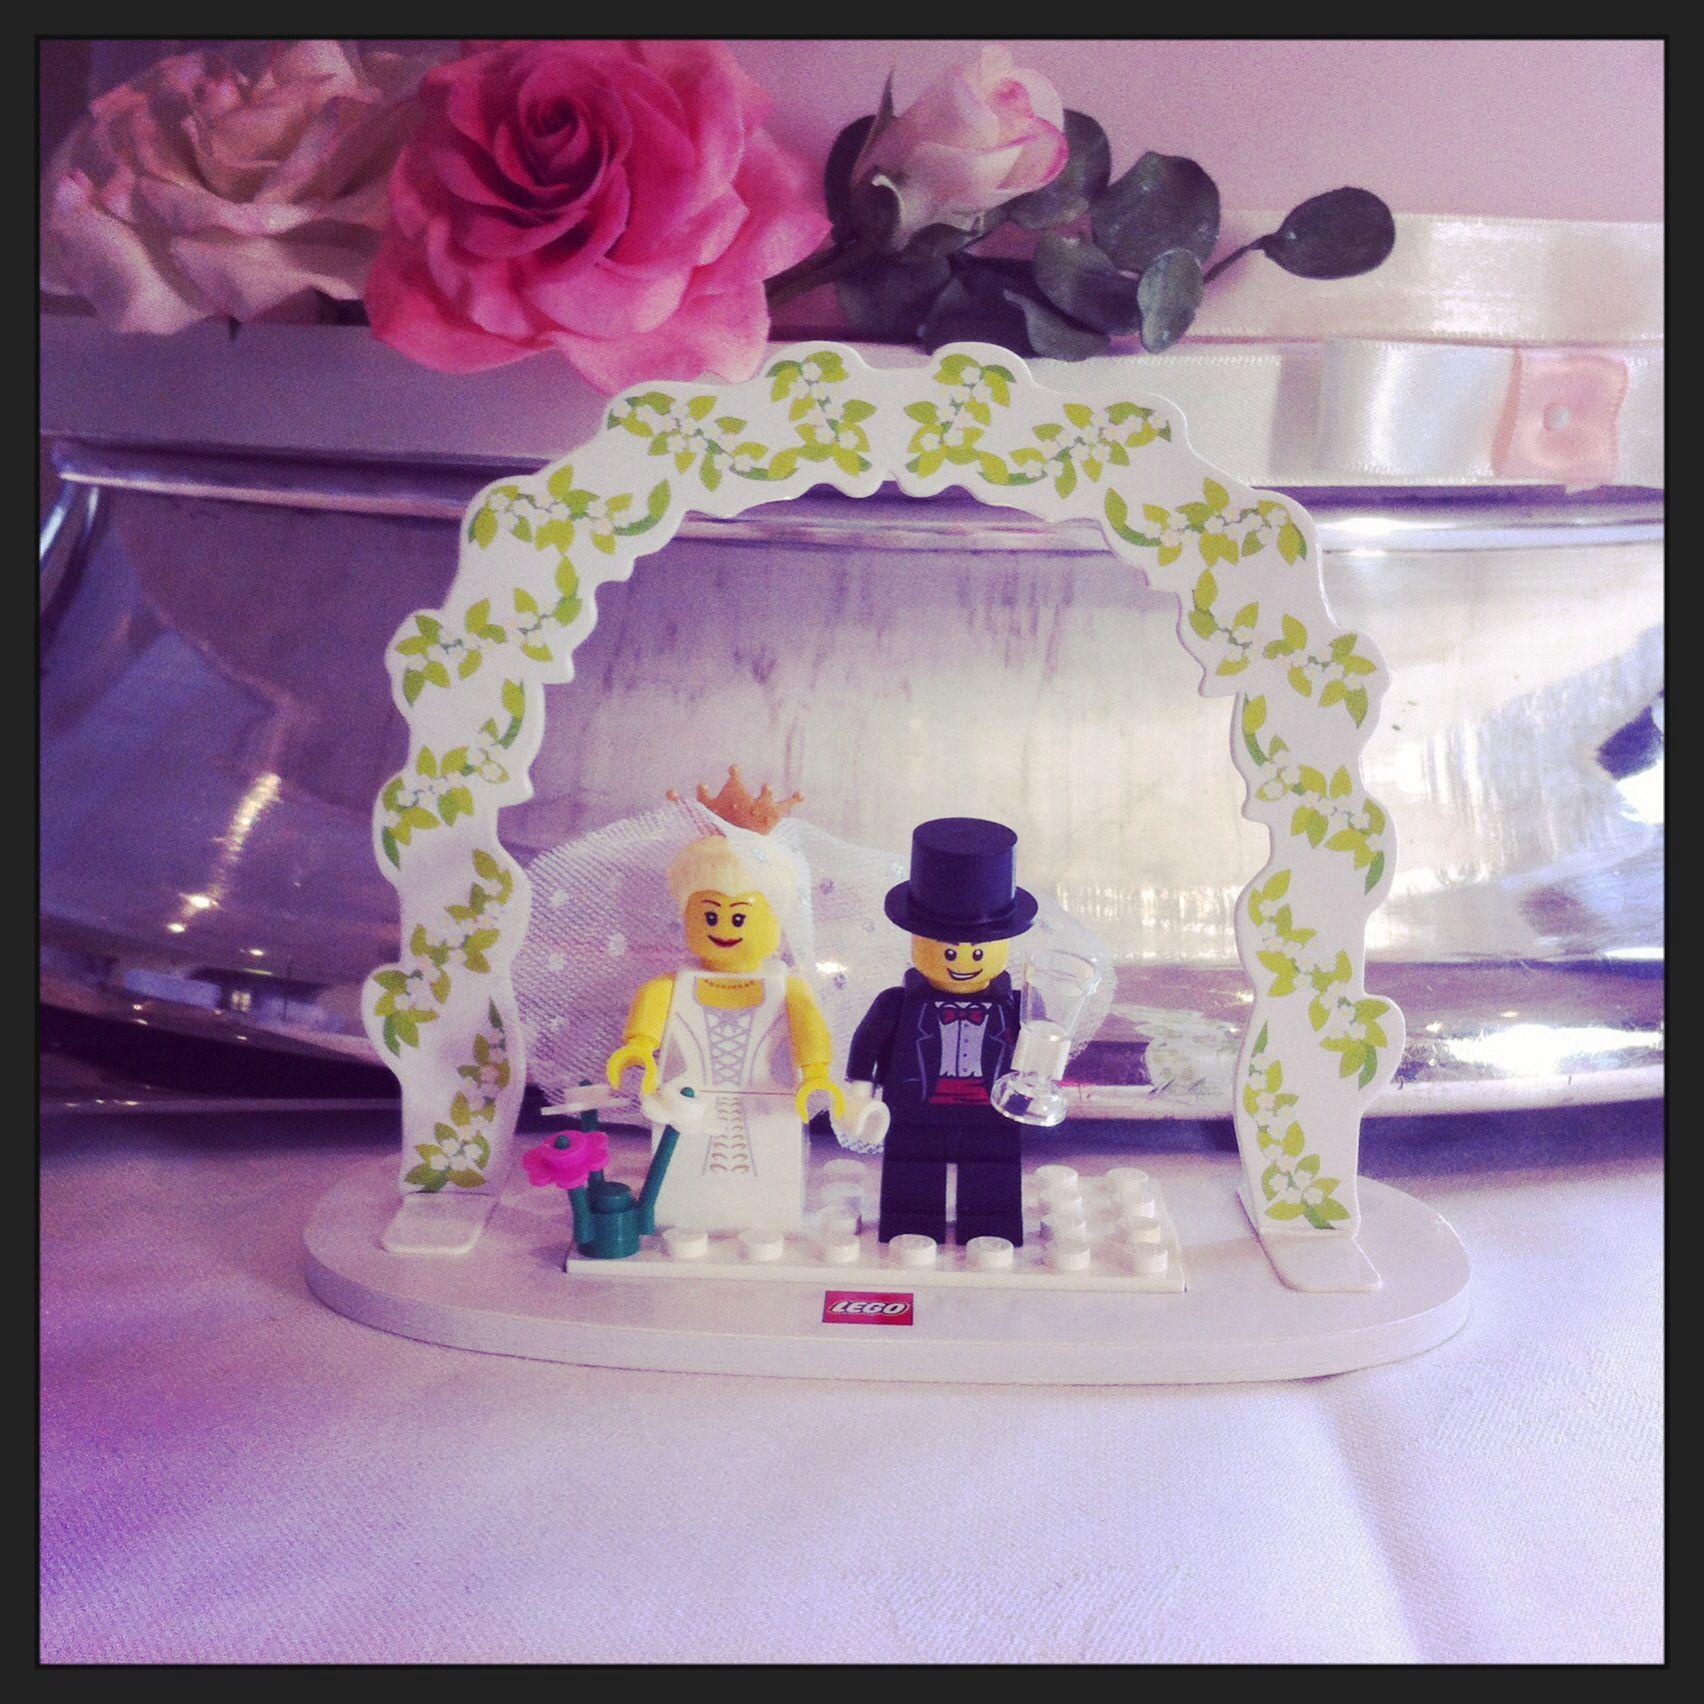 Lego bride and groom cake topper caketopper weddingcake